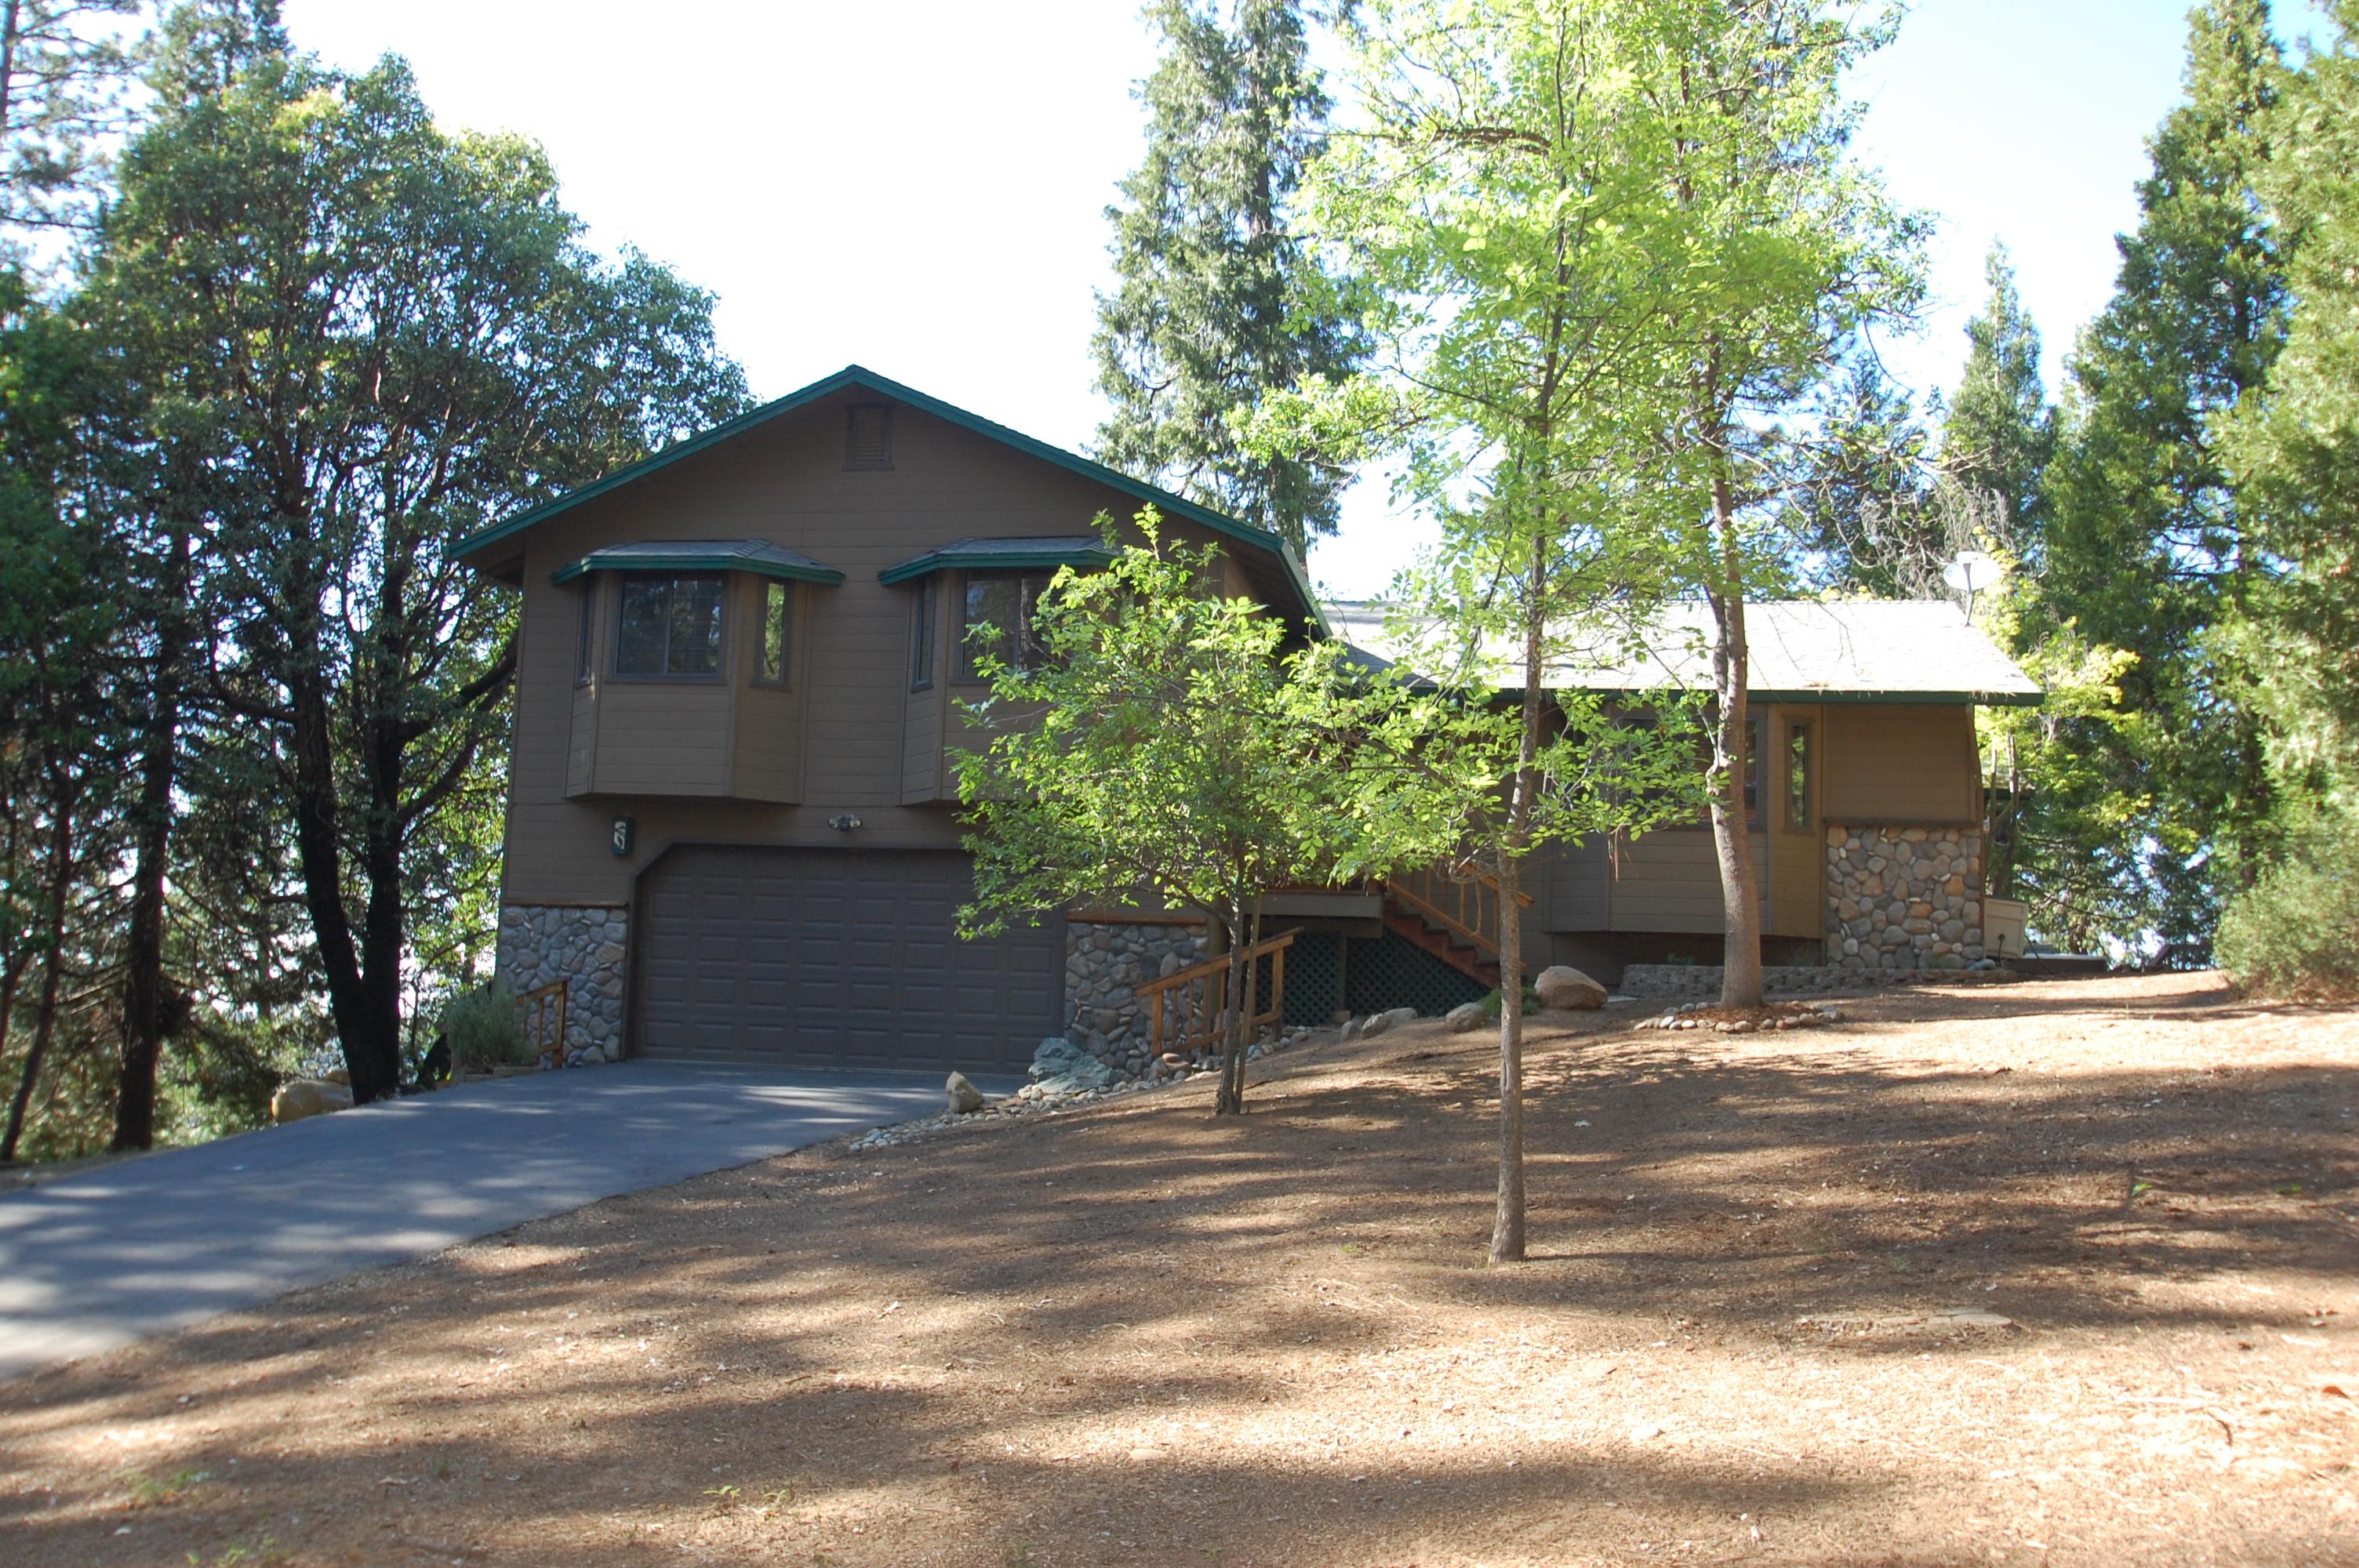 15751 Happie Lou Lane, Pioneer, California 95666